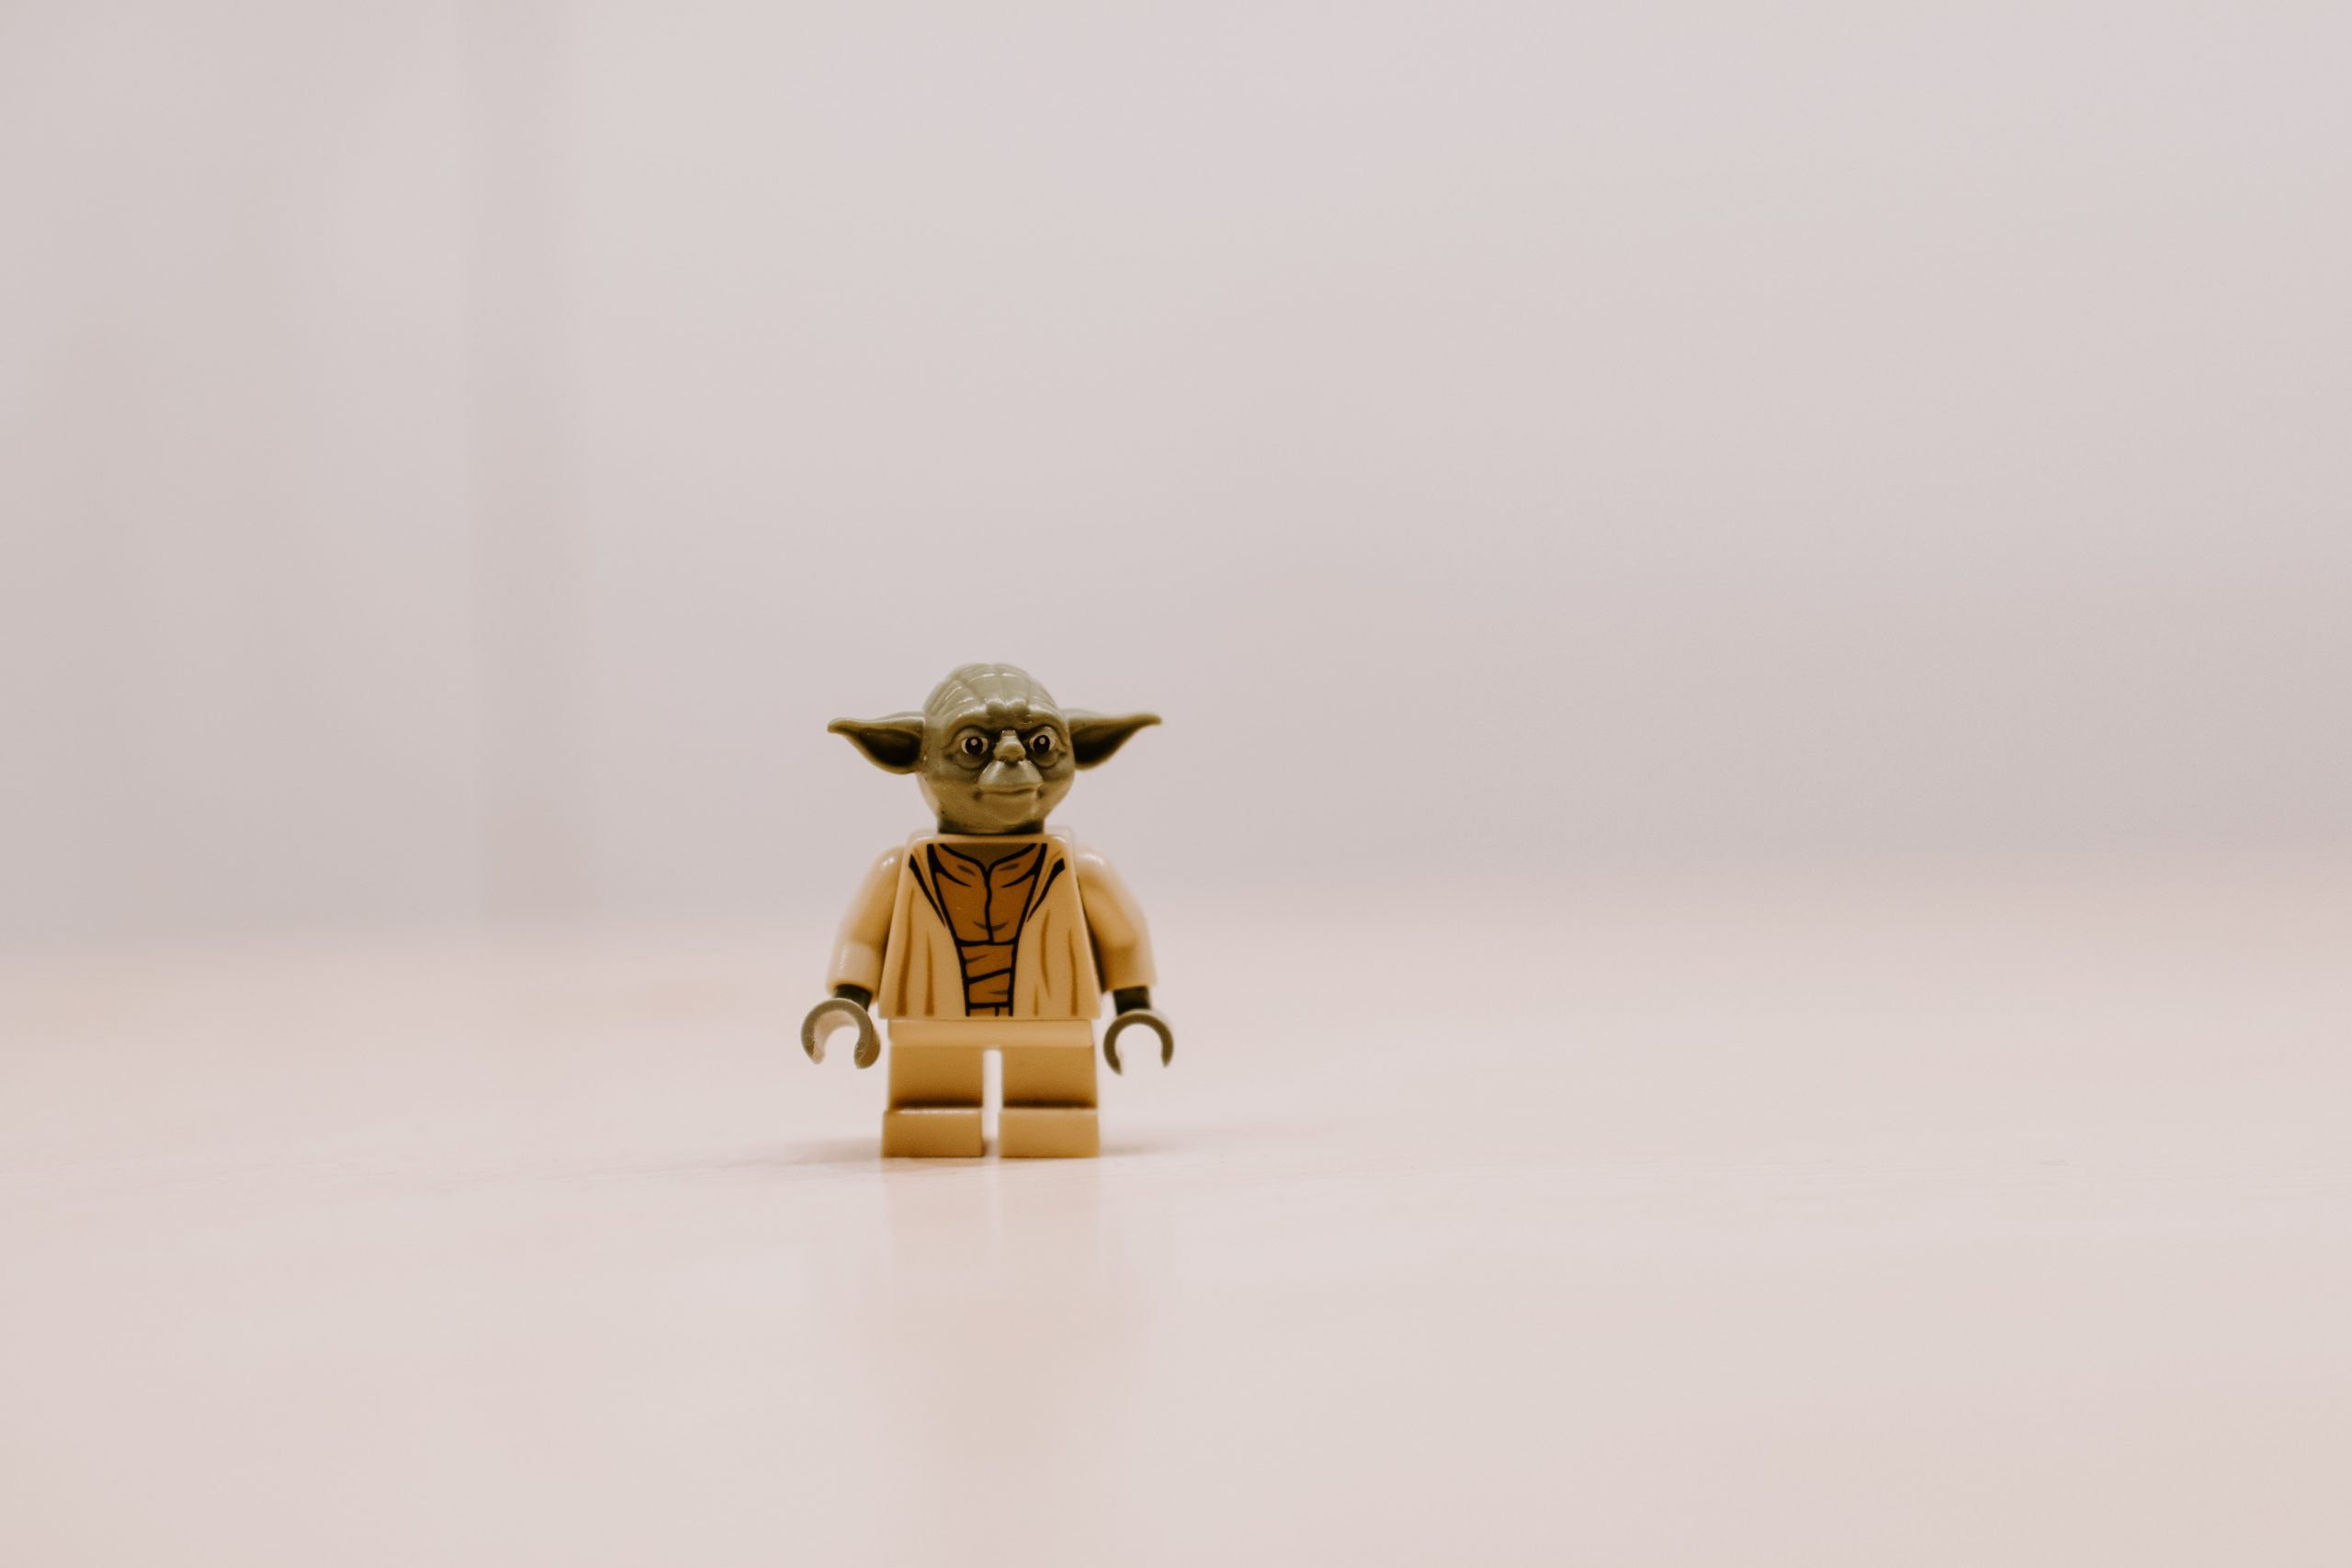 Yoda DevOps Position DMG